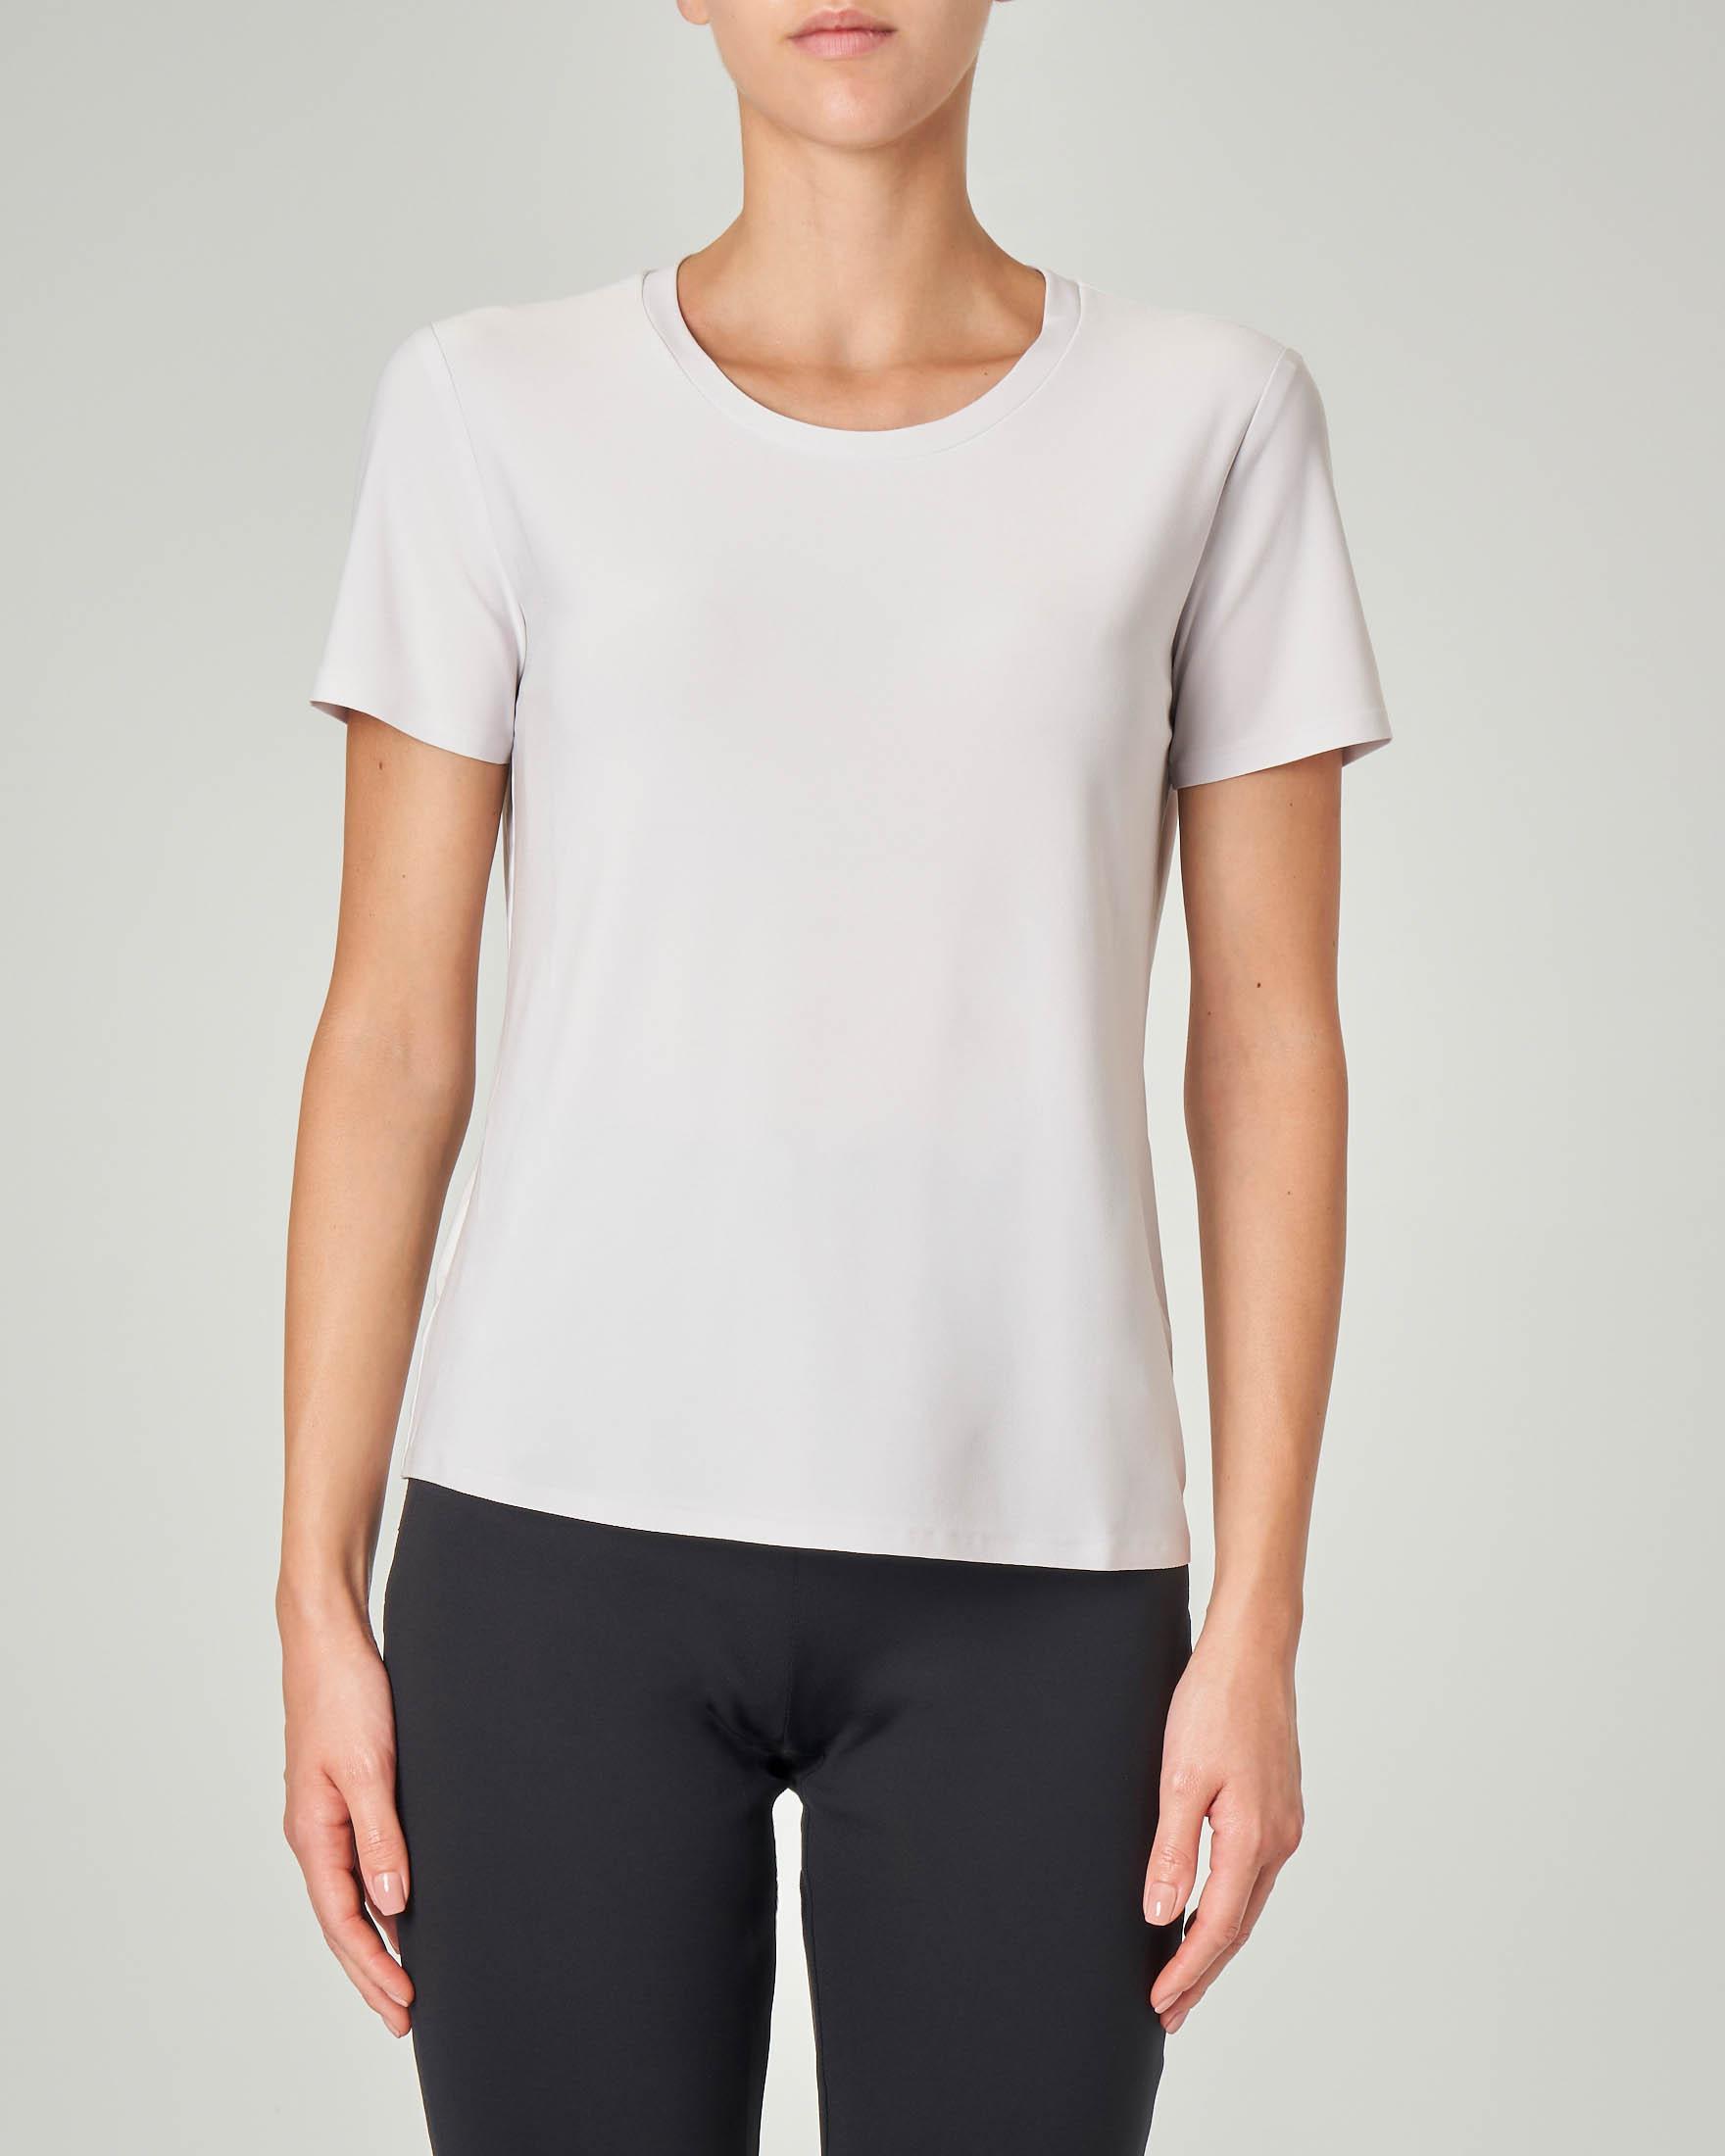 T-shirt maniche corte color gesso in tessuto stretch